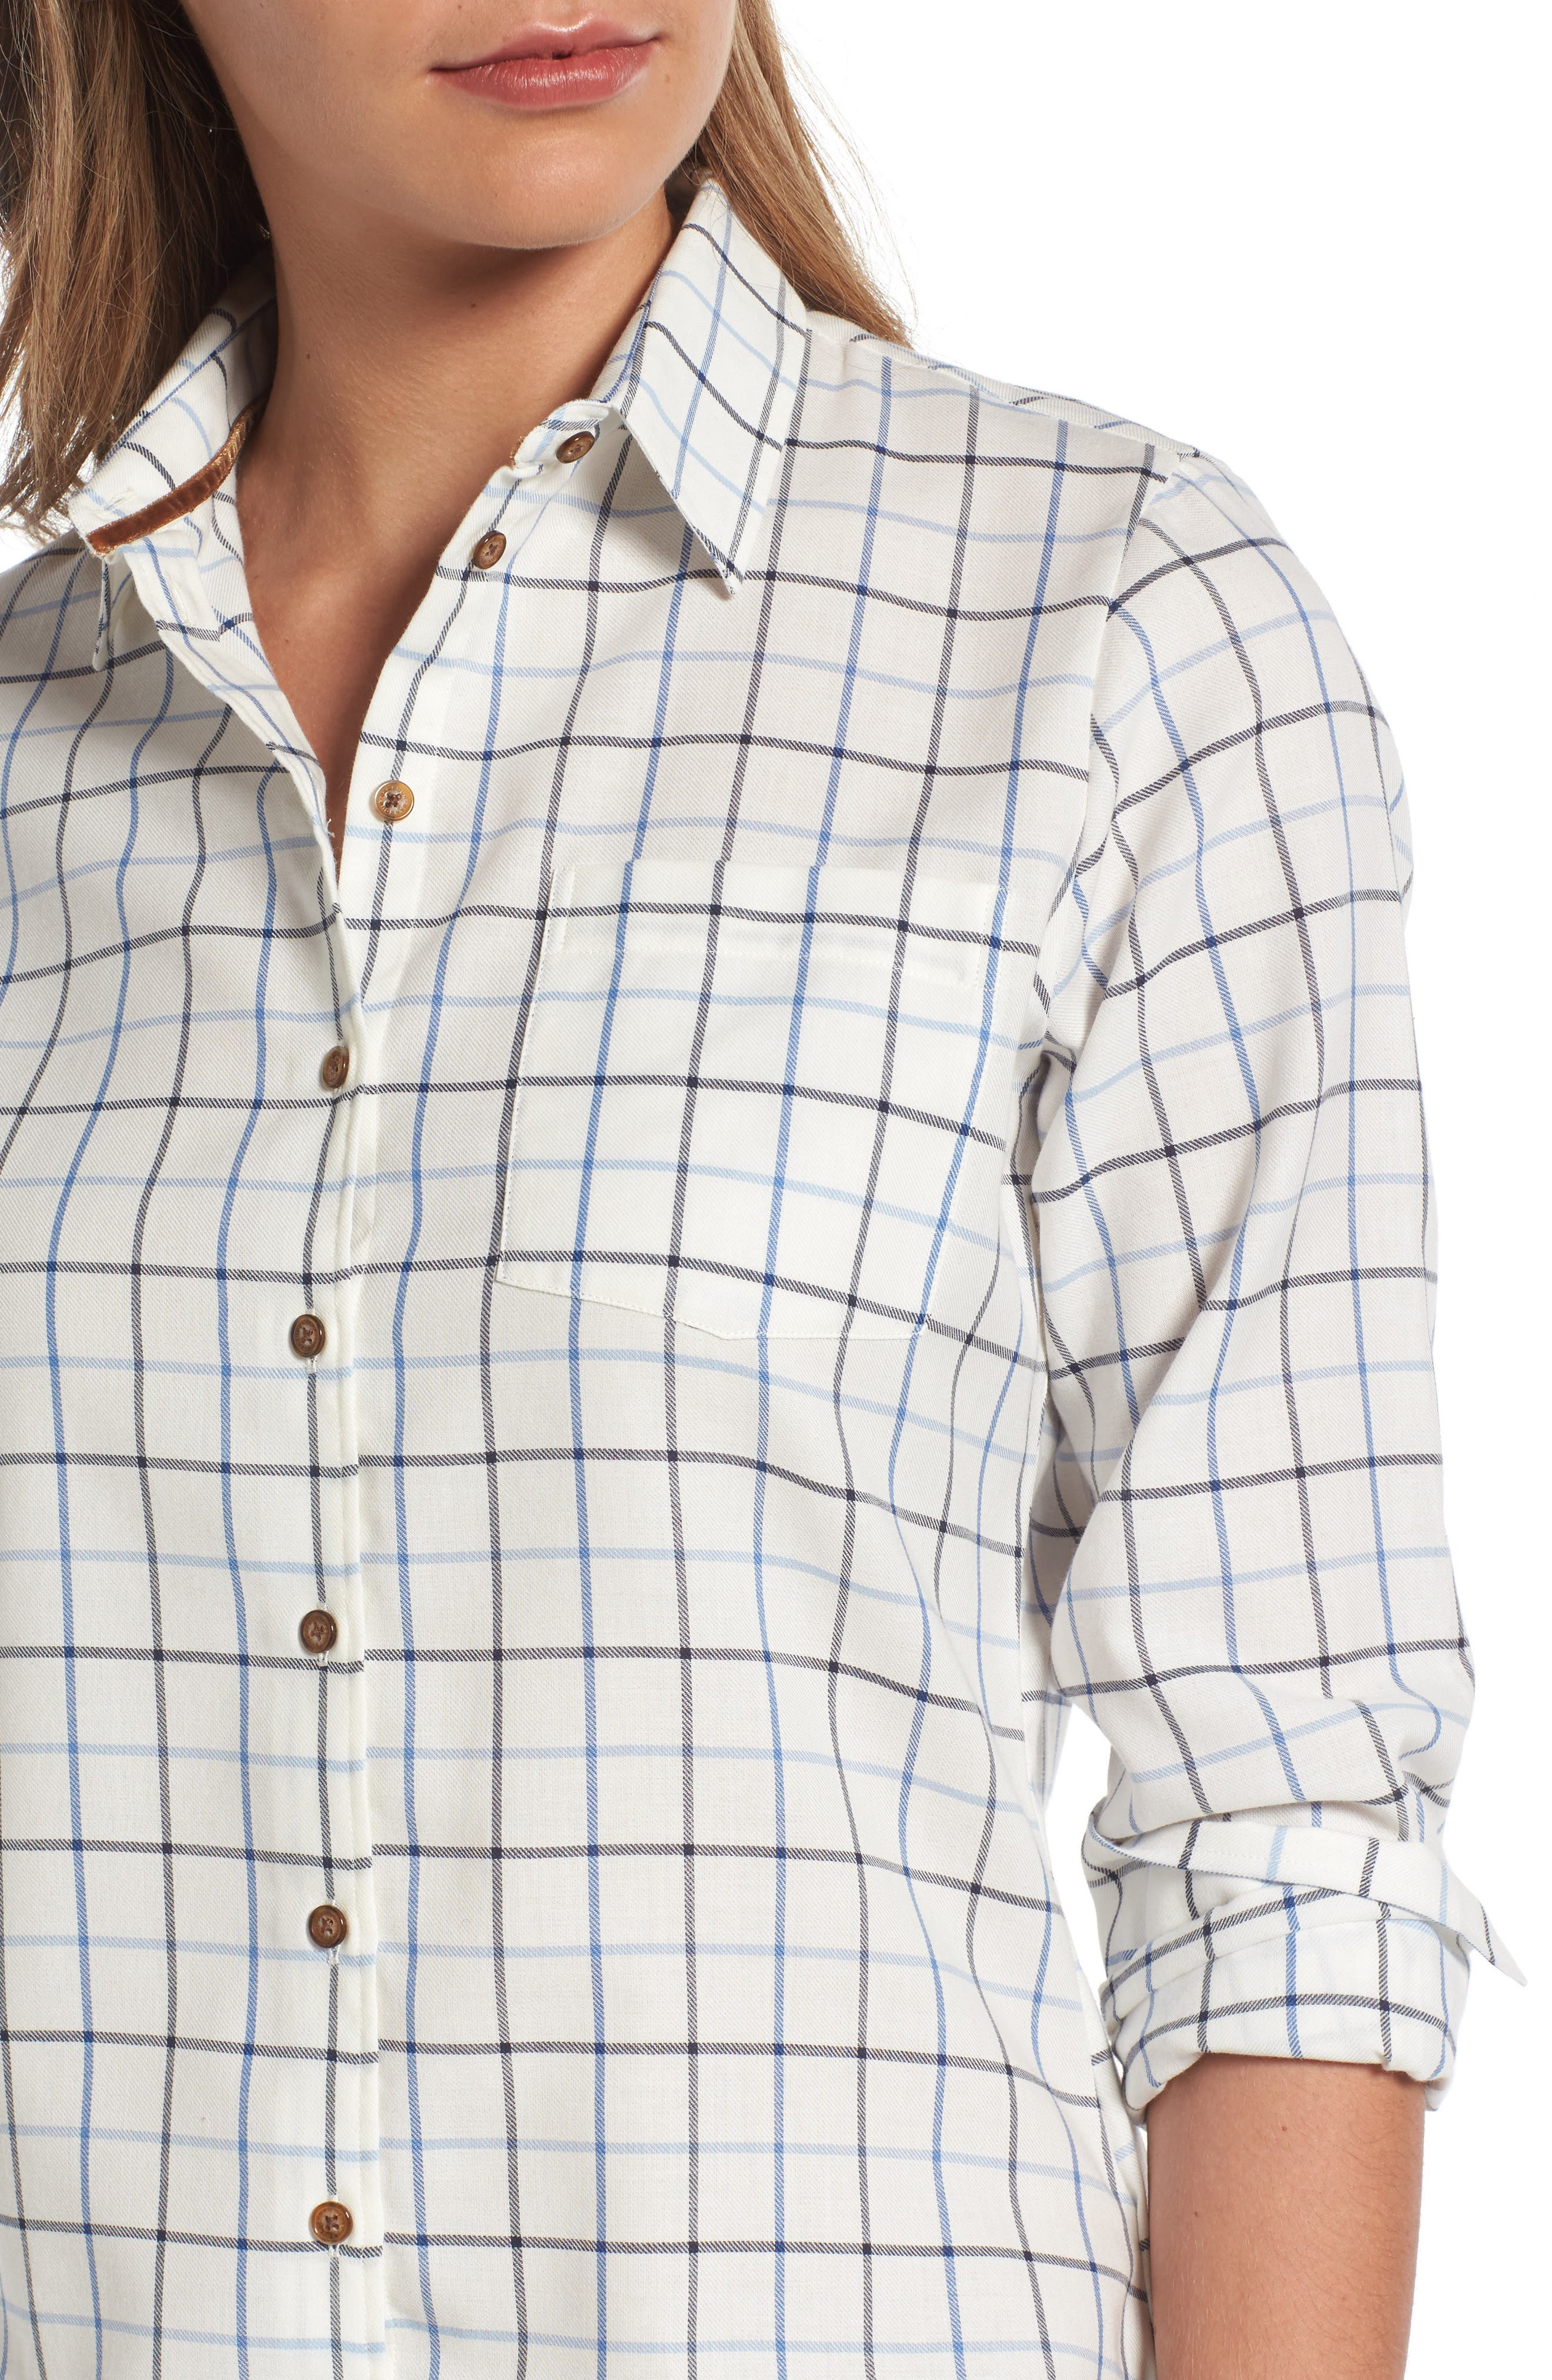 Triplebar Check Shirt,                             Alternate thumbnail 4, color,                             450